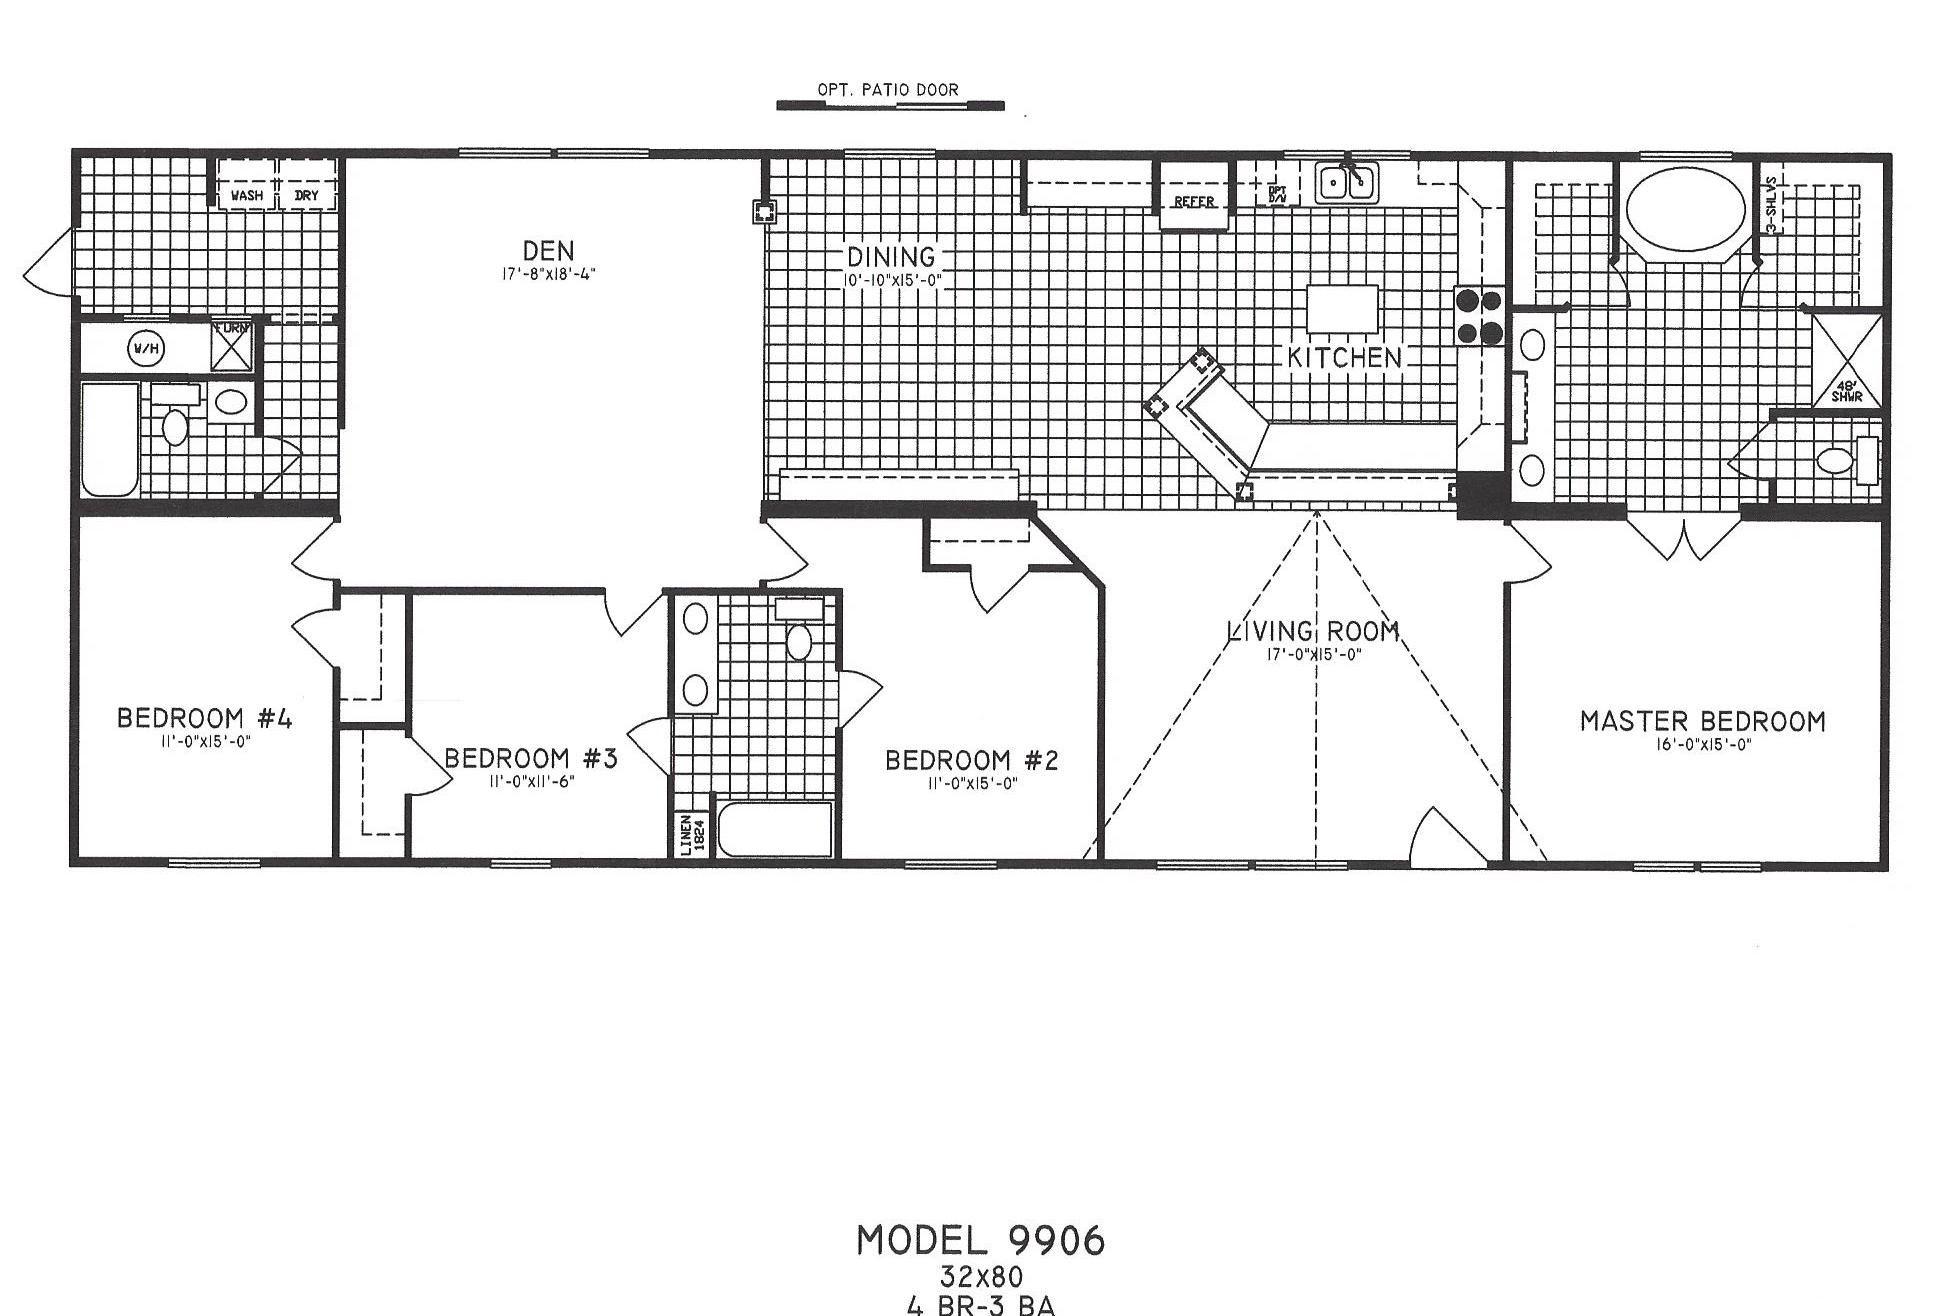 modular home floor plans 4 bedrooms new plan with jack